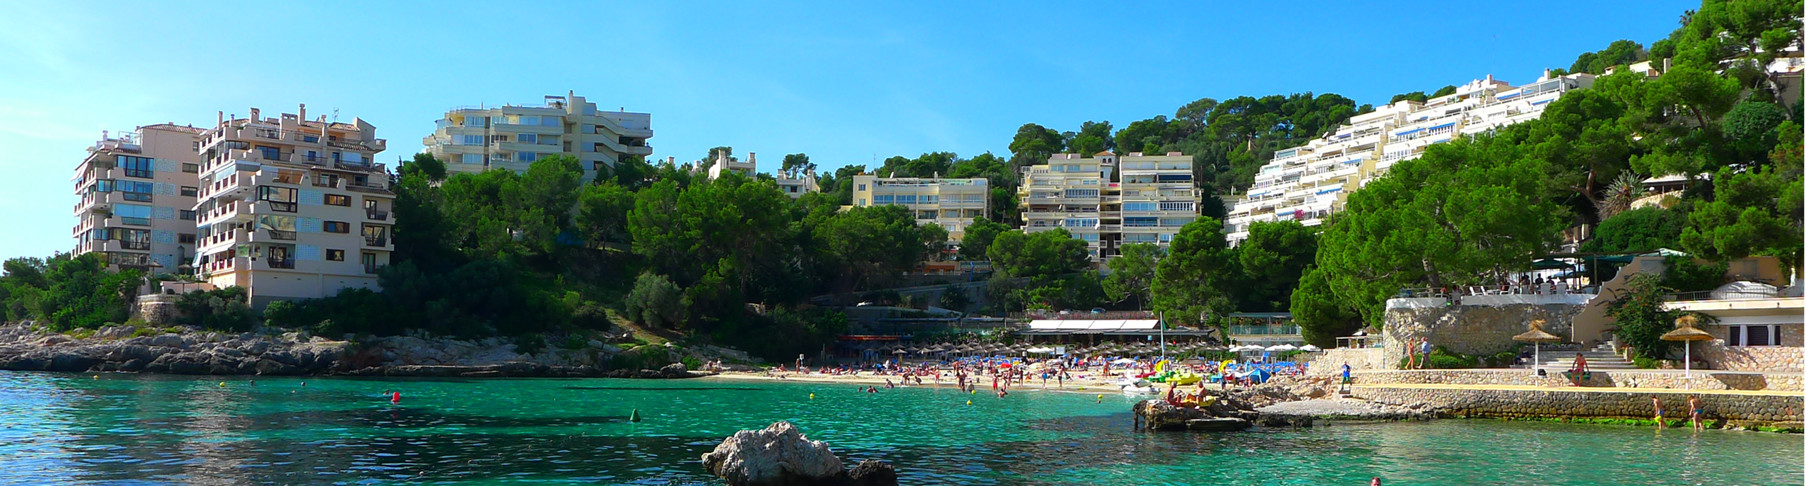 Image-Mallorca